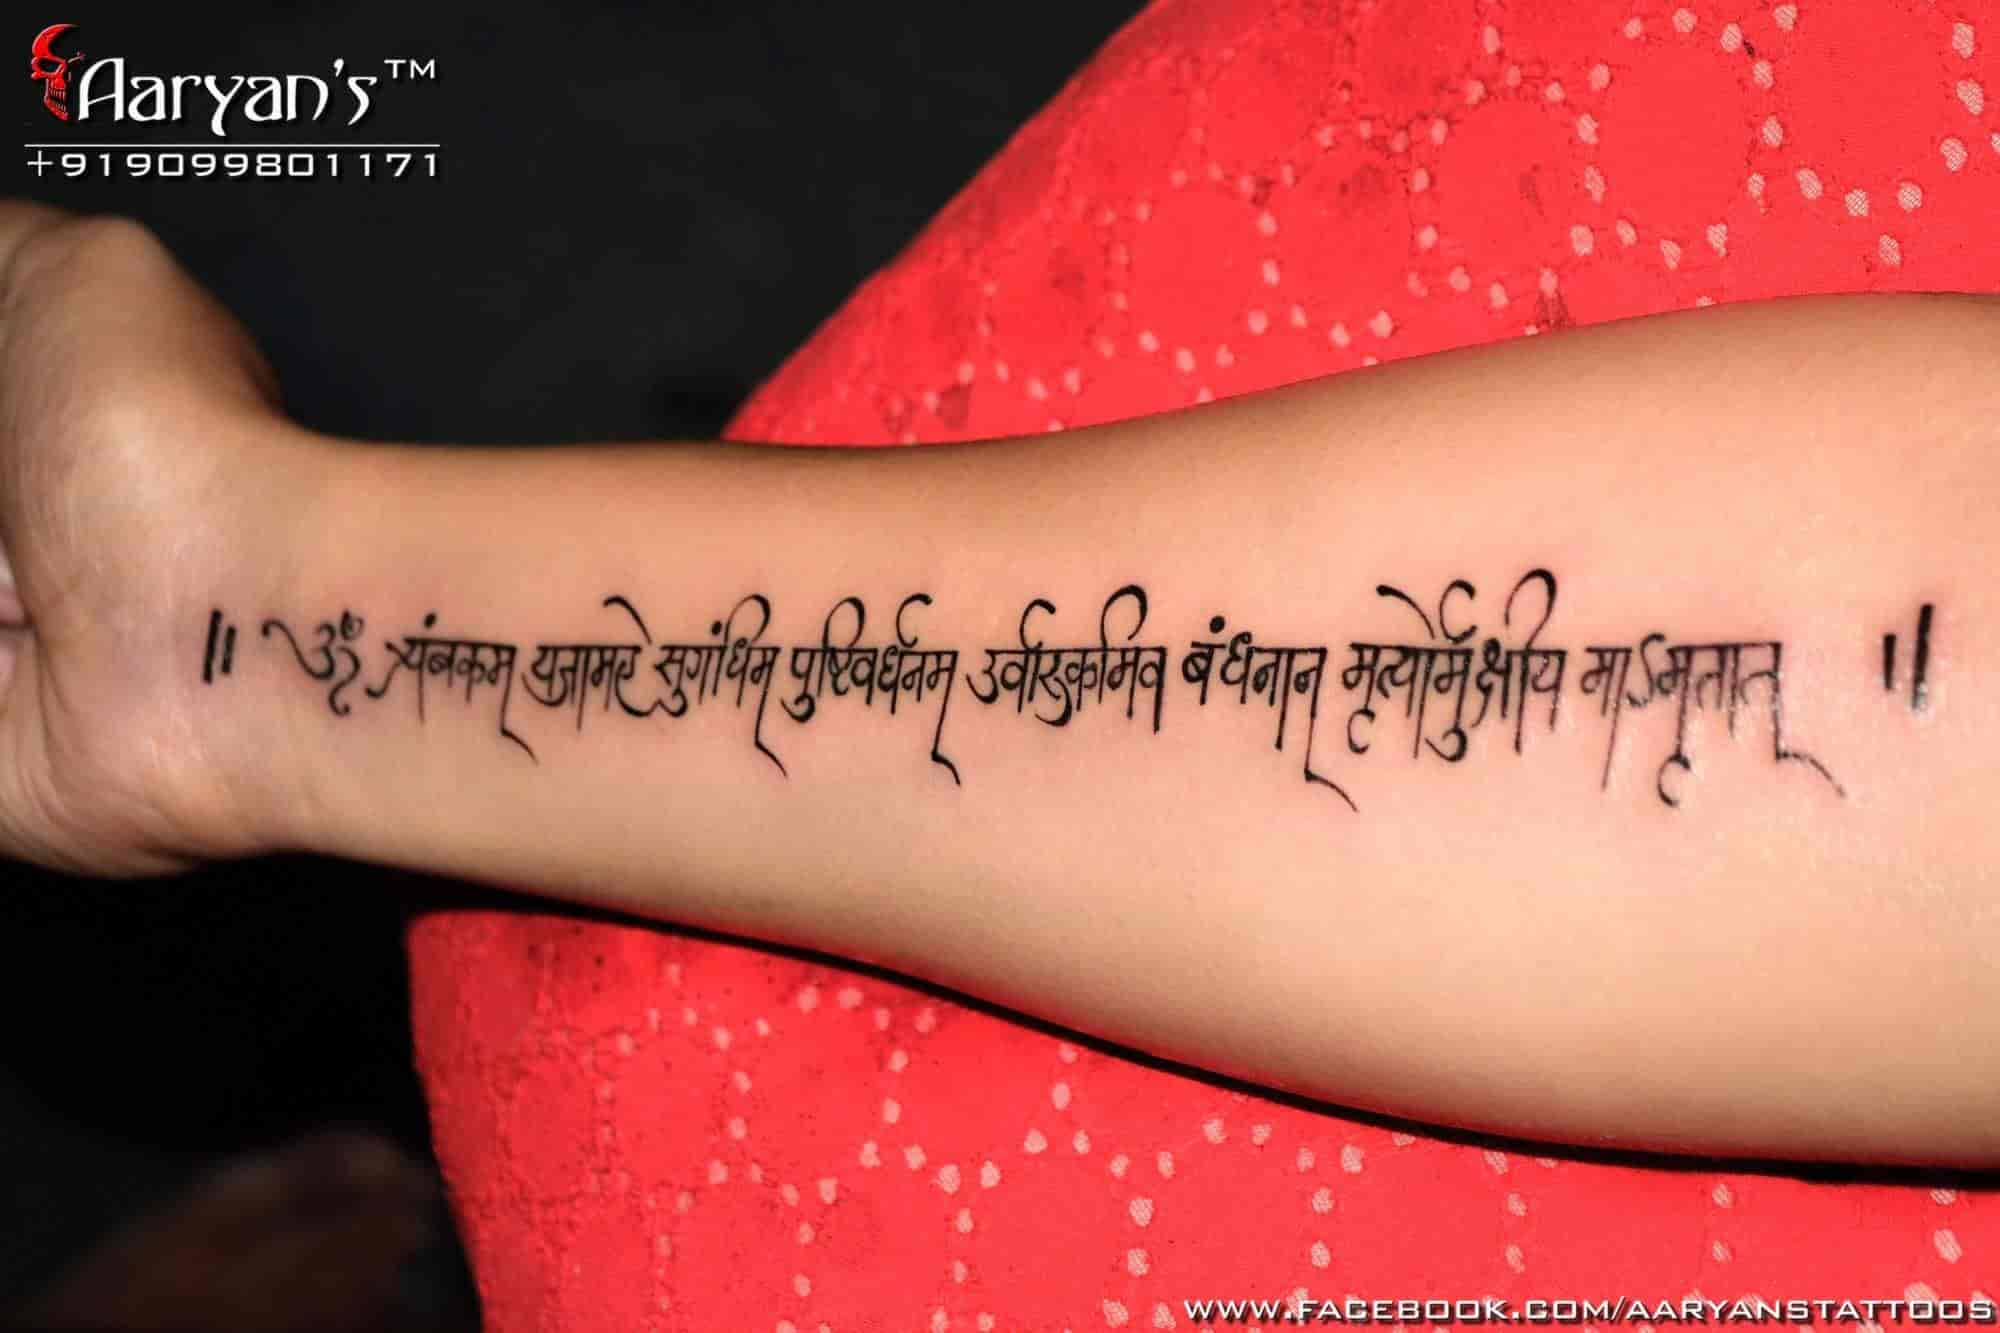 Aaryans Tattoos And Body Piercing Photos Bodakdev Ahmedabad